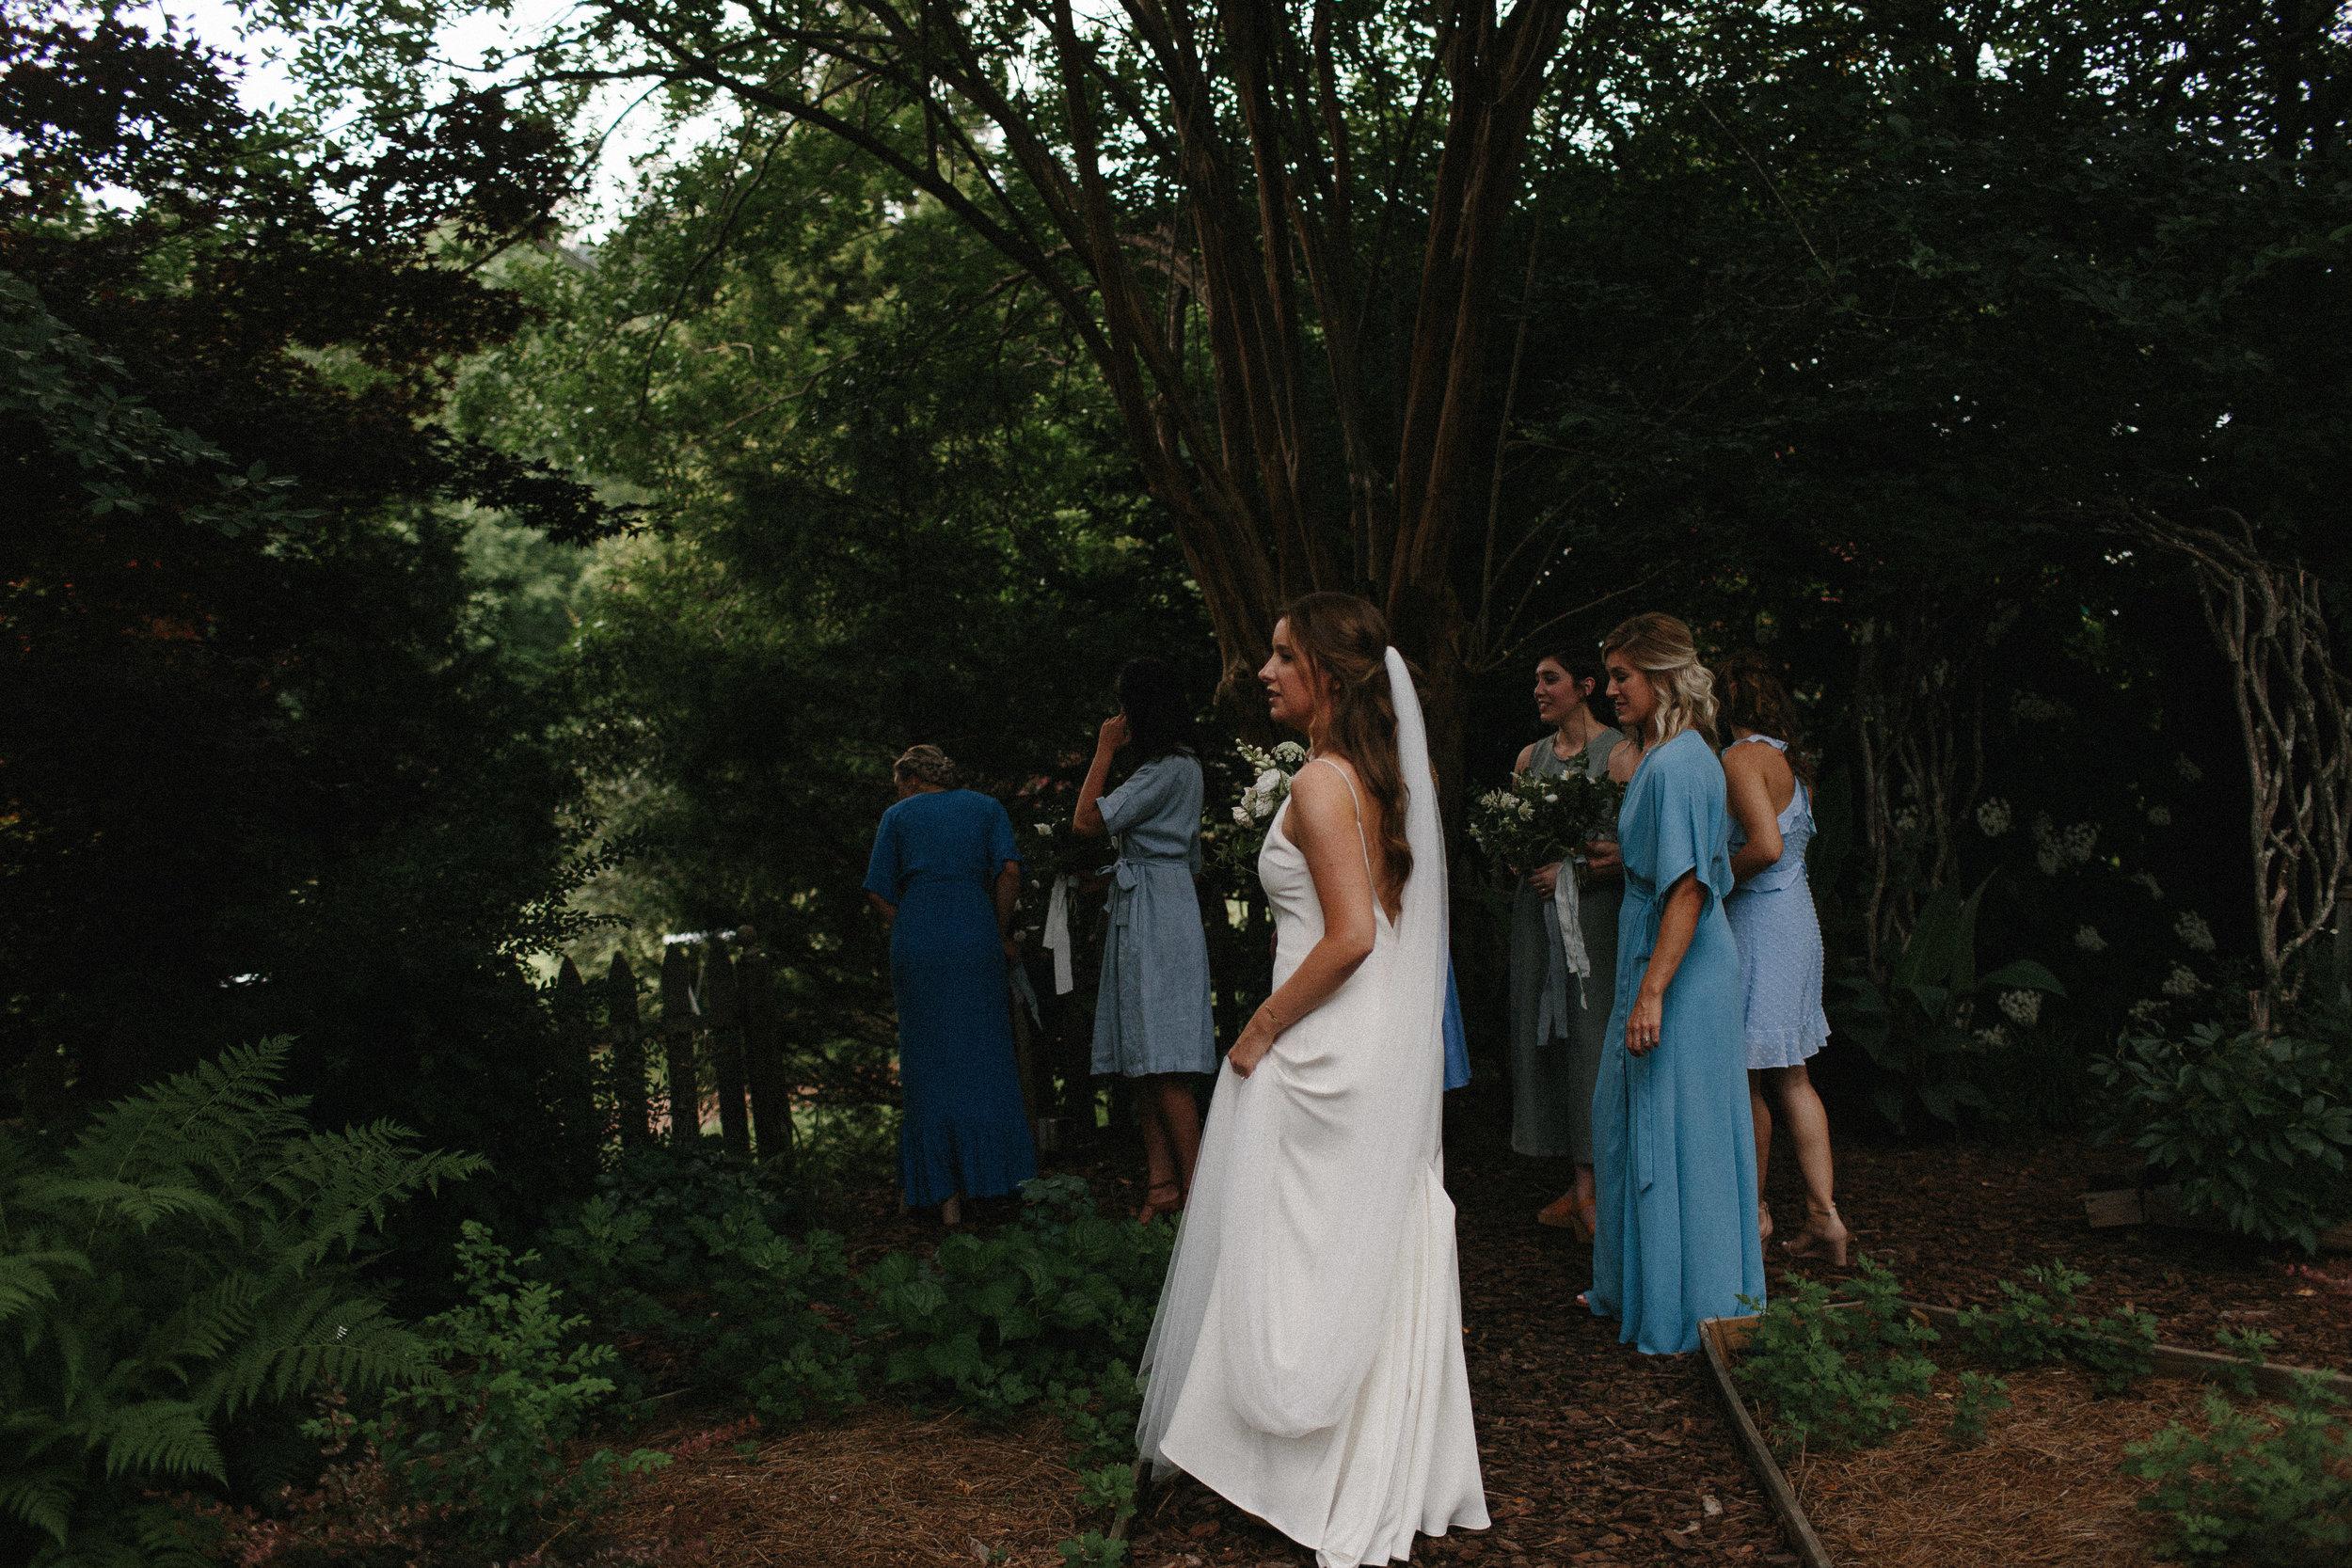 glen_ella_meadow_creekside_atlanta_wedding_photographers_1244.jpg